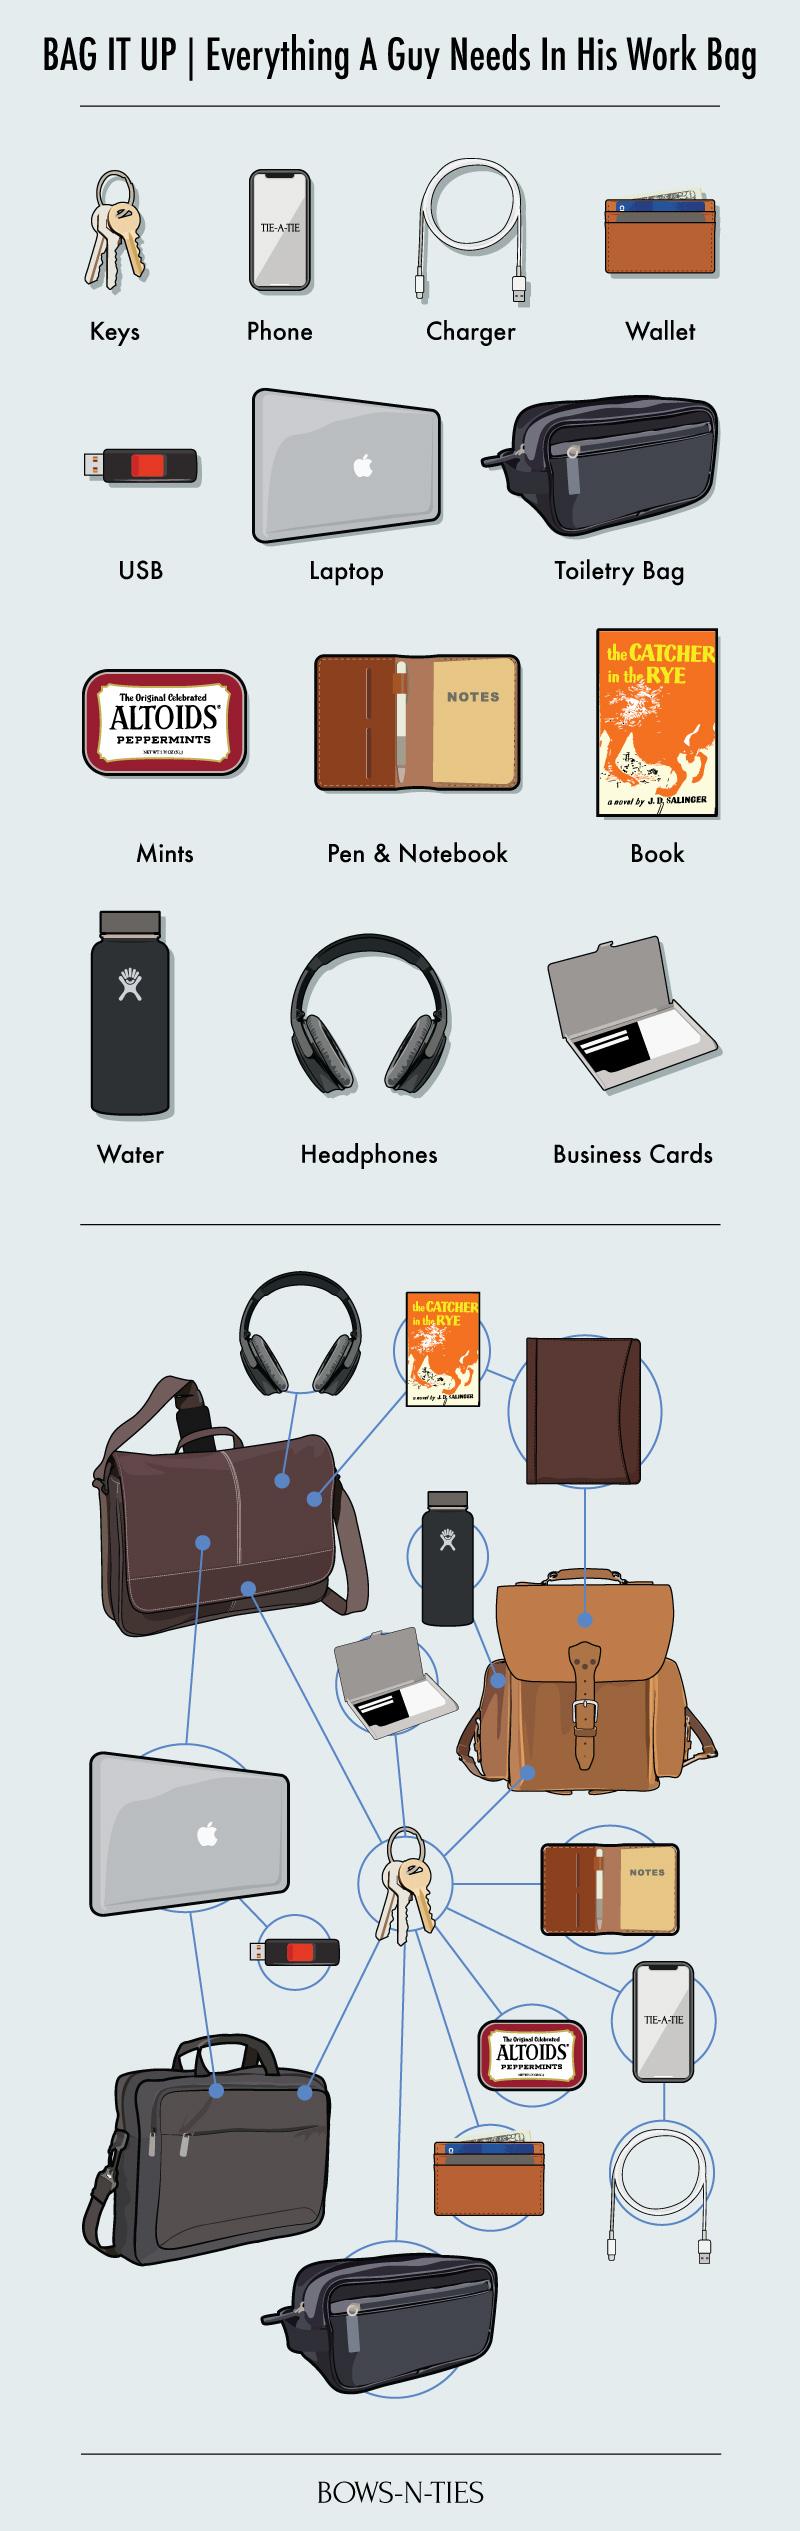 Computer Bag Infographic